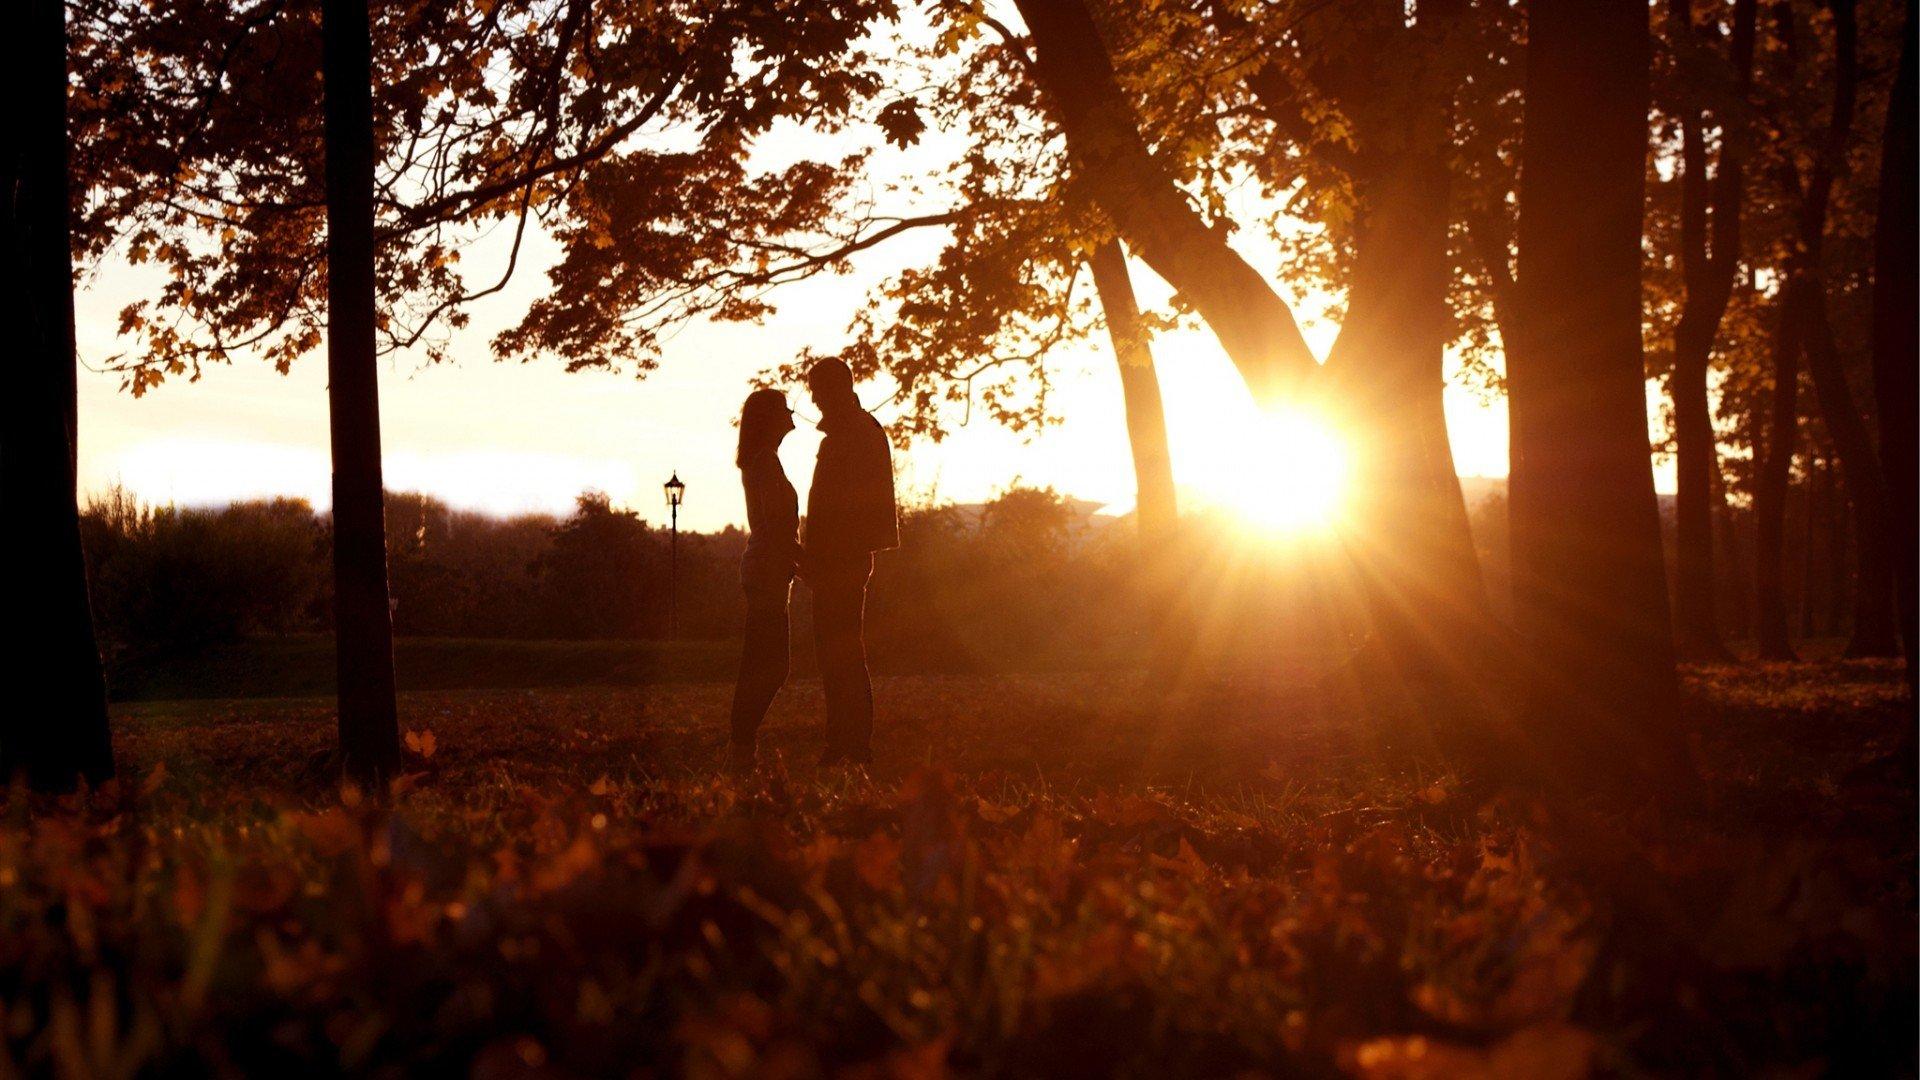 Поцелуй в лесу картинка